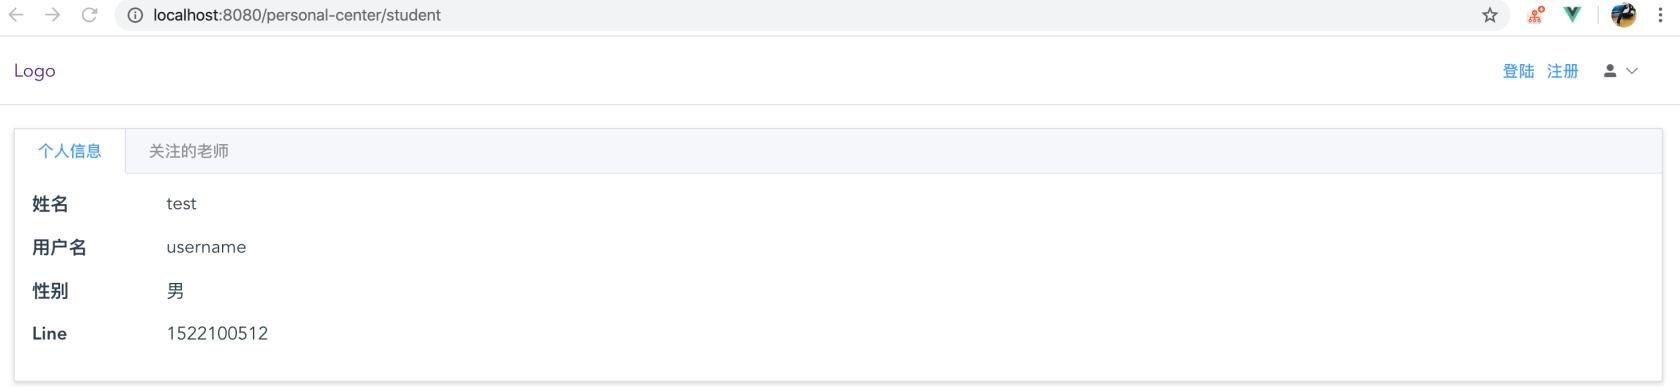 Vue.js+Laravel 前后端分离 API 多用户多表登陆课题(四)